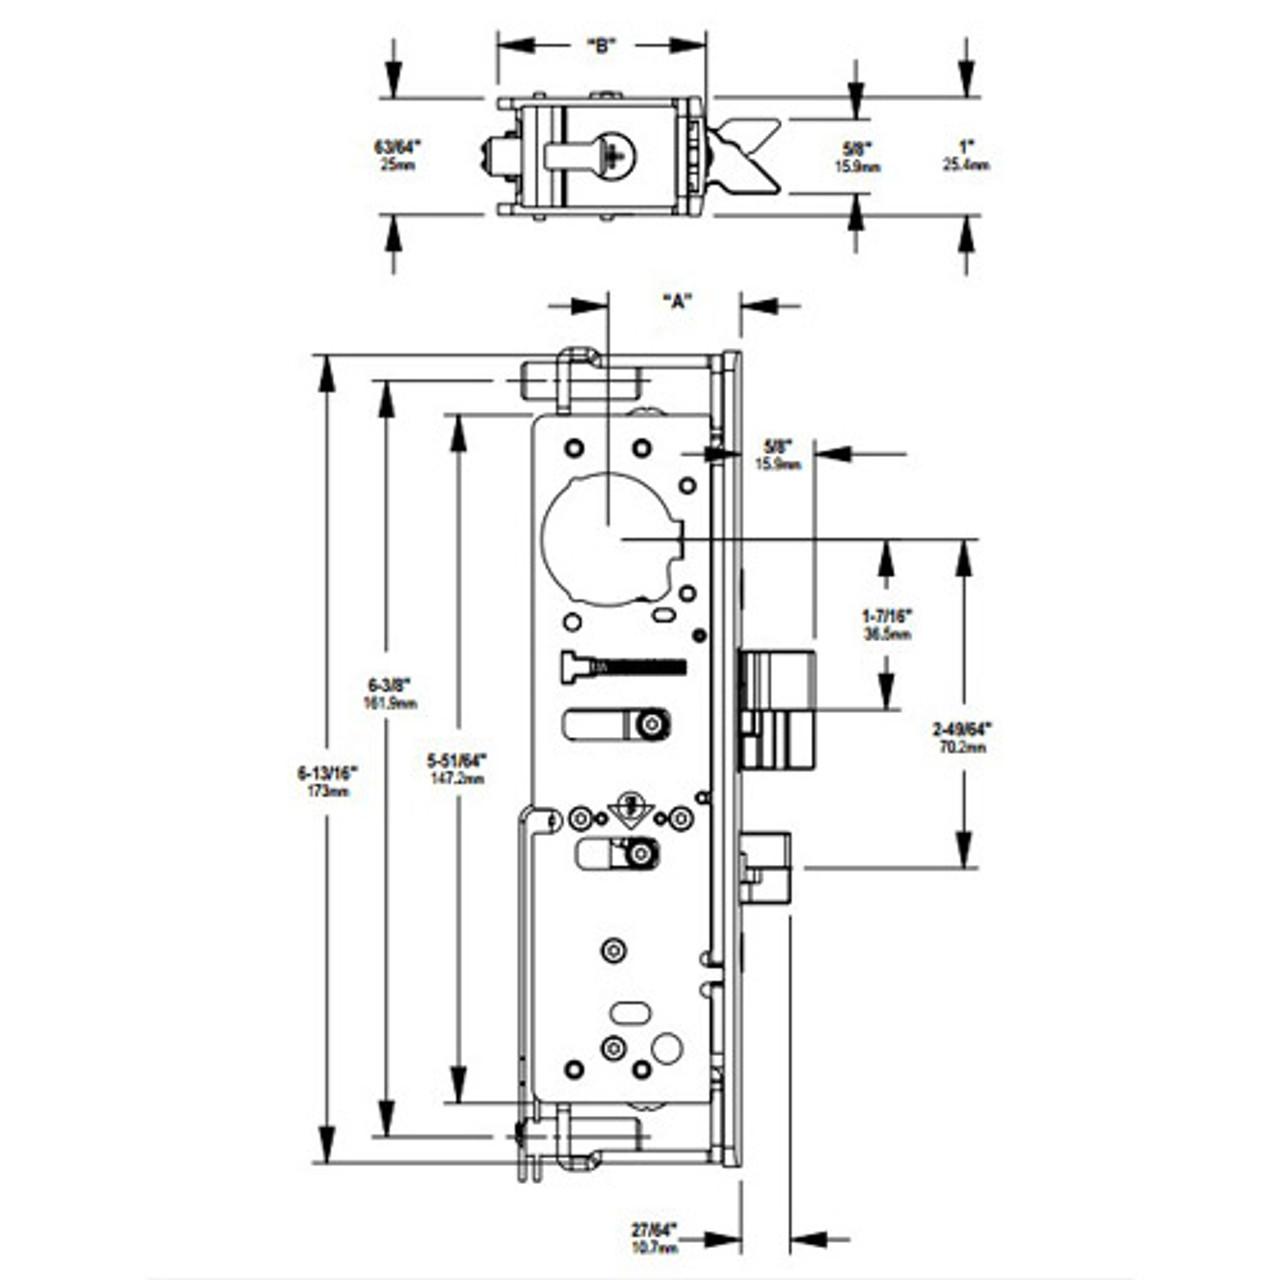 4300-20-117-313 Adams Rite Electrified Deadlatch Dimensional View